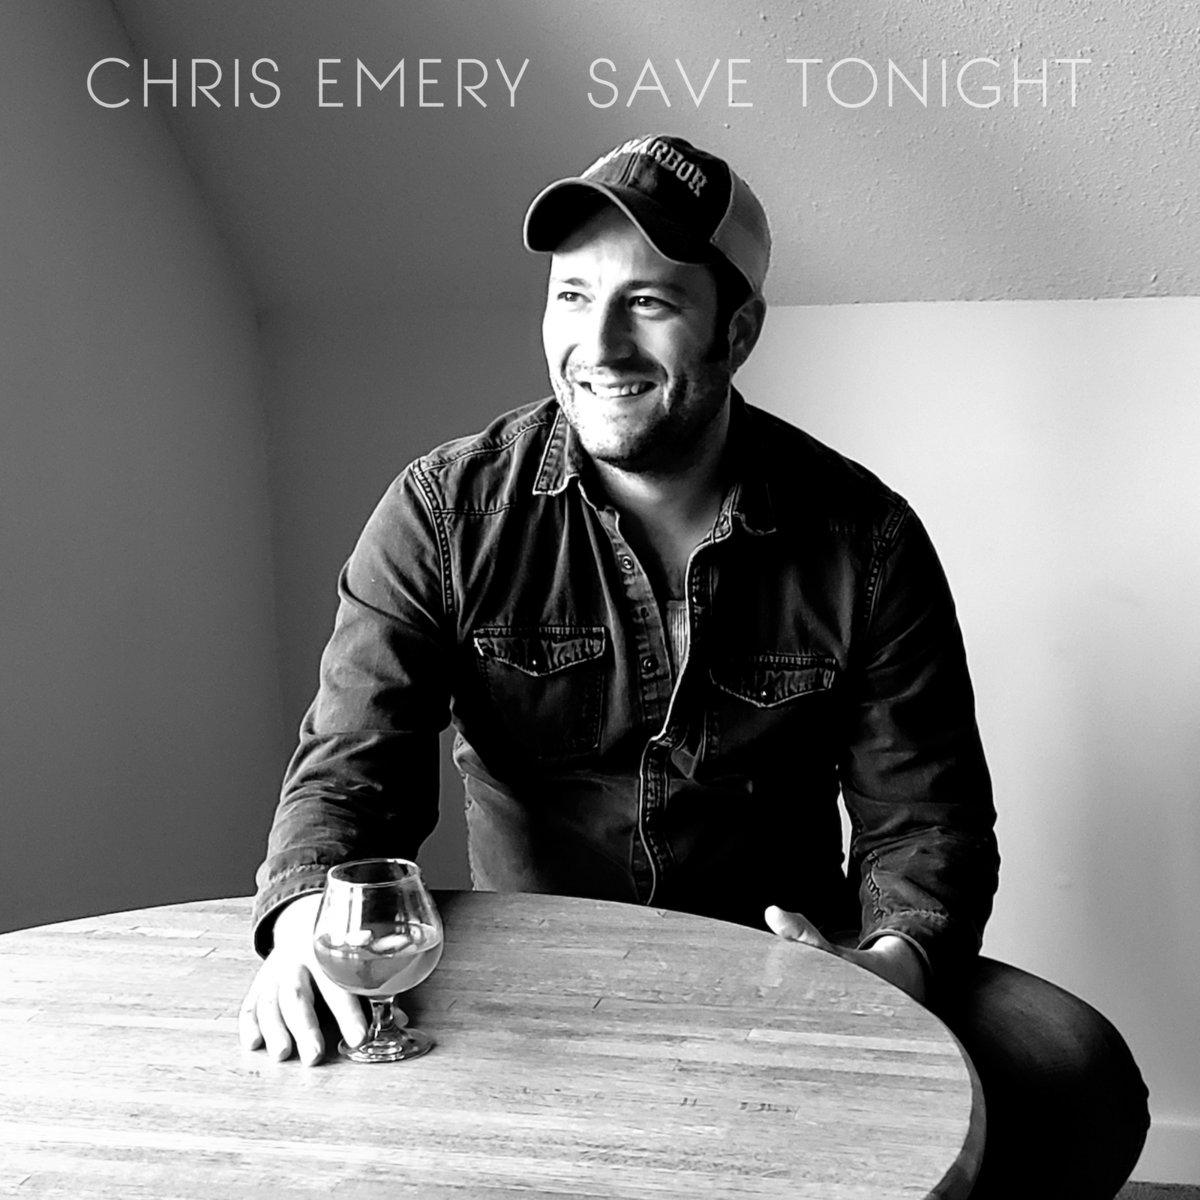 Save Tonight by Chris Emery